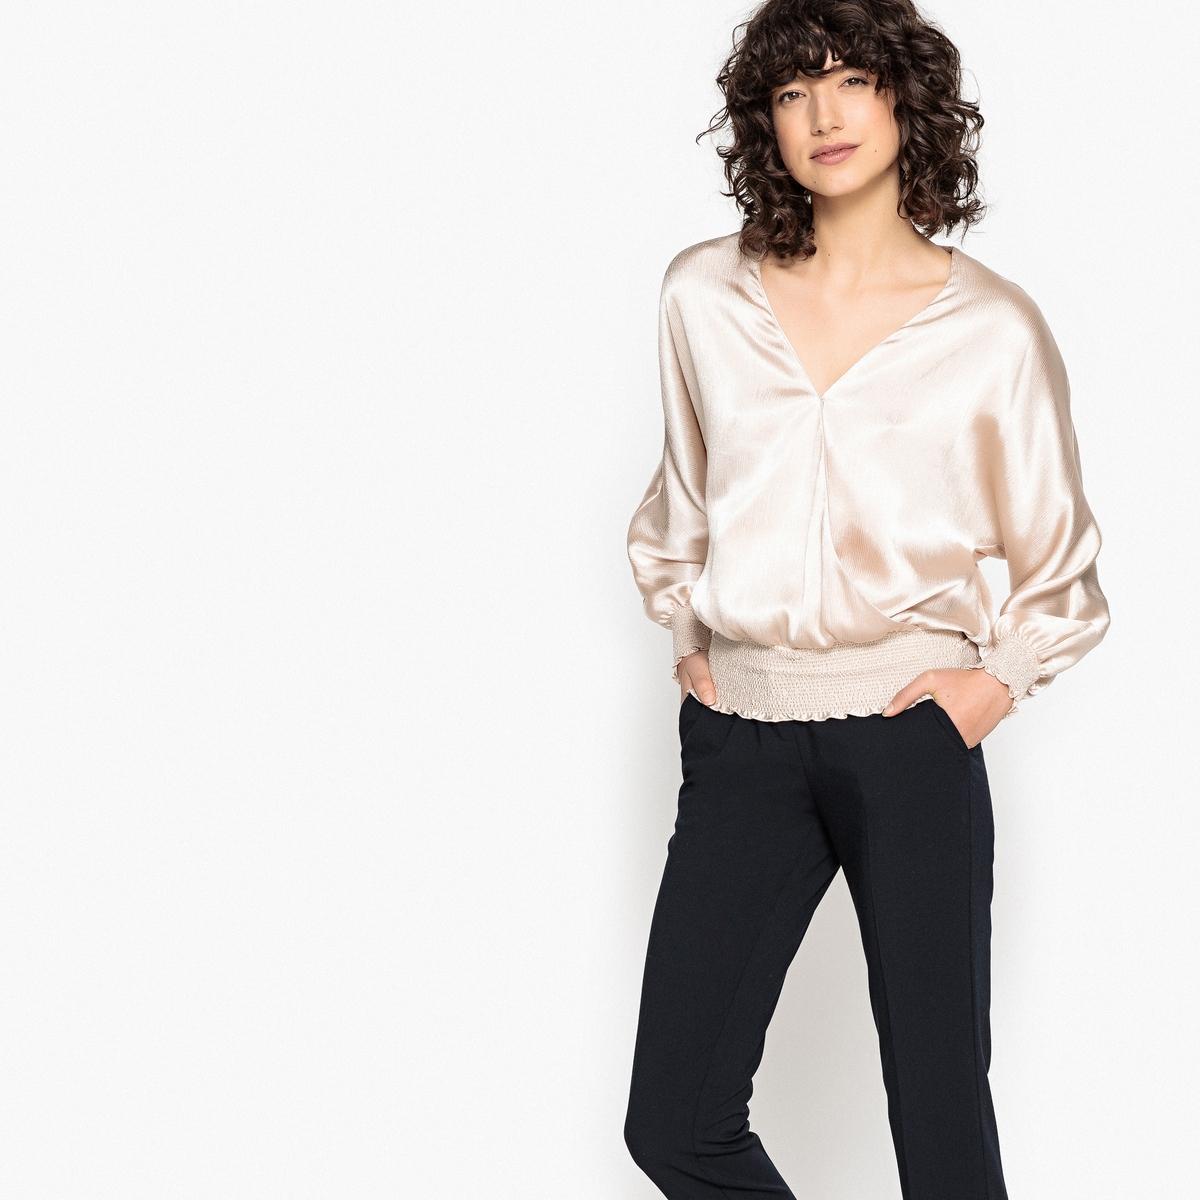 Блузка La Redoute В форме каш-кер края рукавов со складками 34 (FR) - 40 (RUS) розовый пижама каш кер